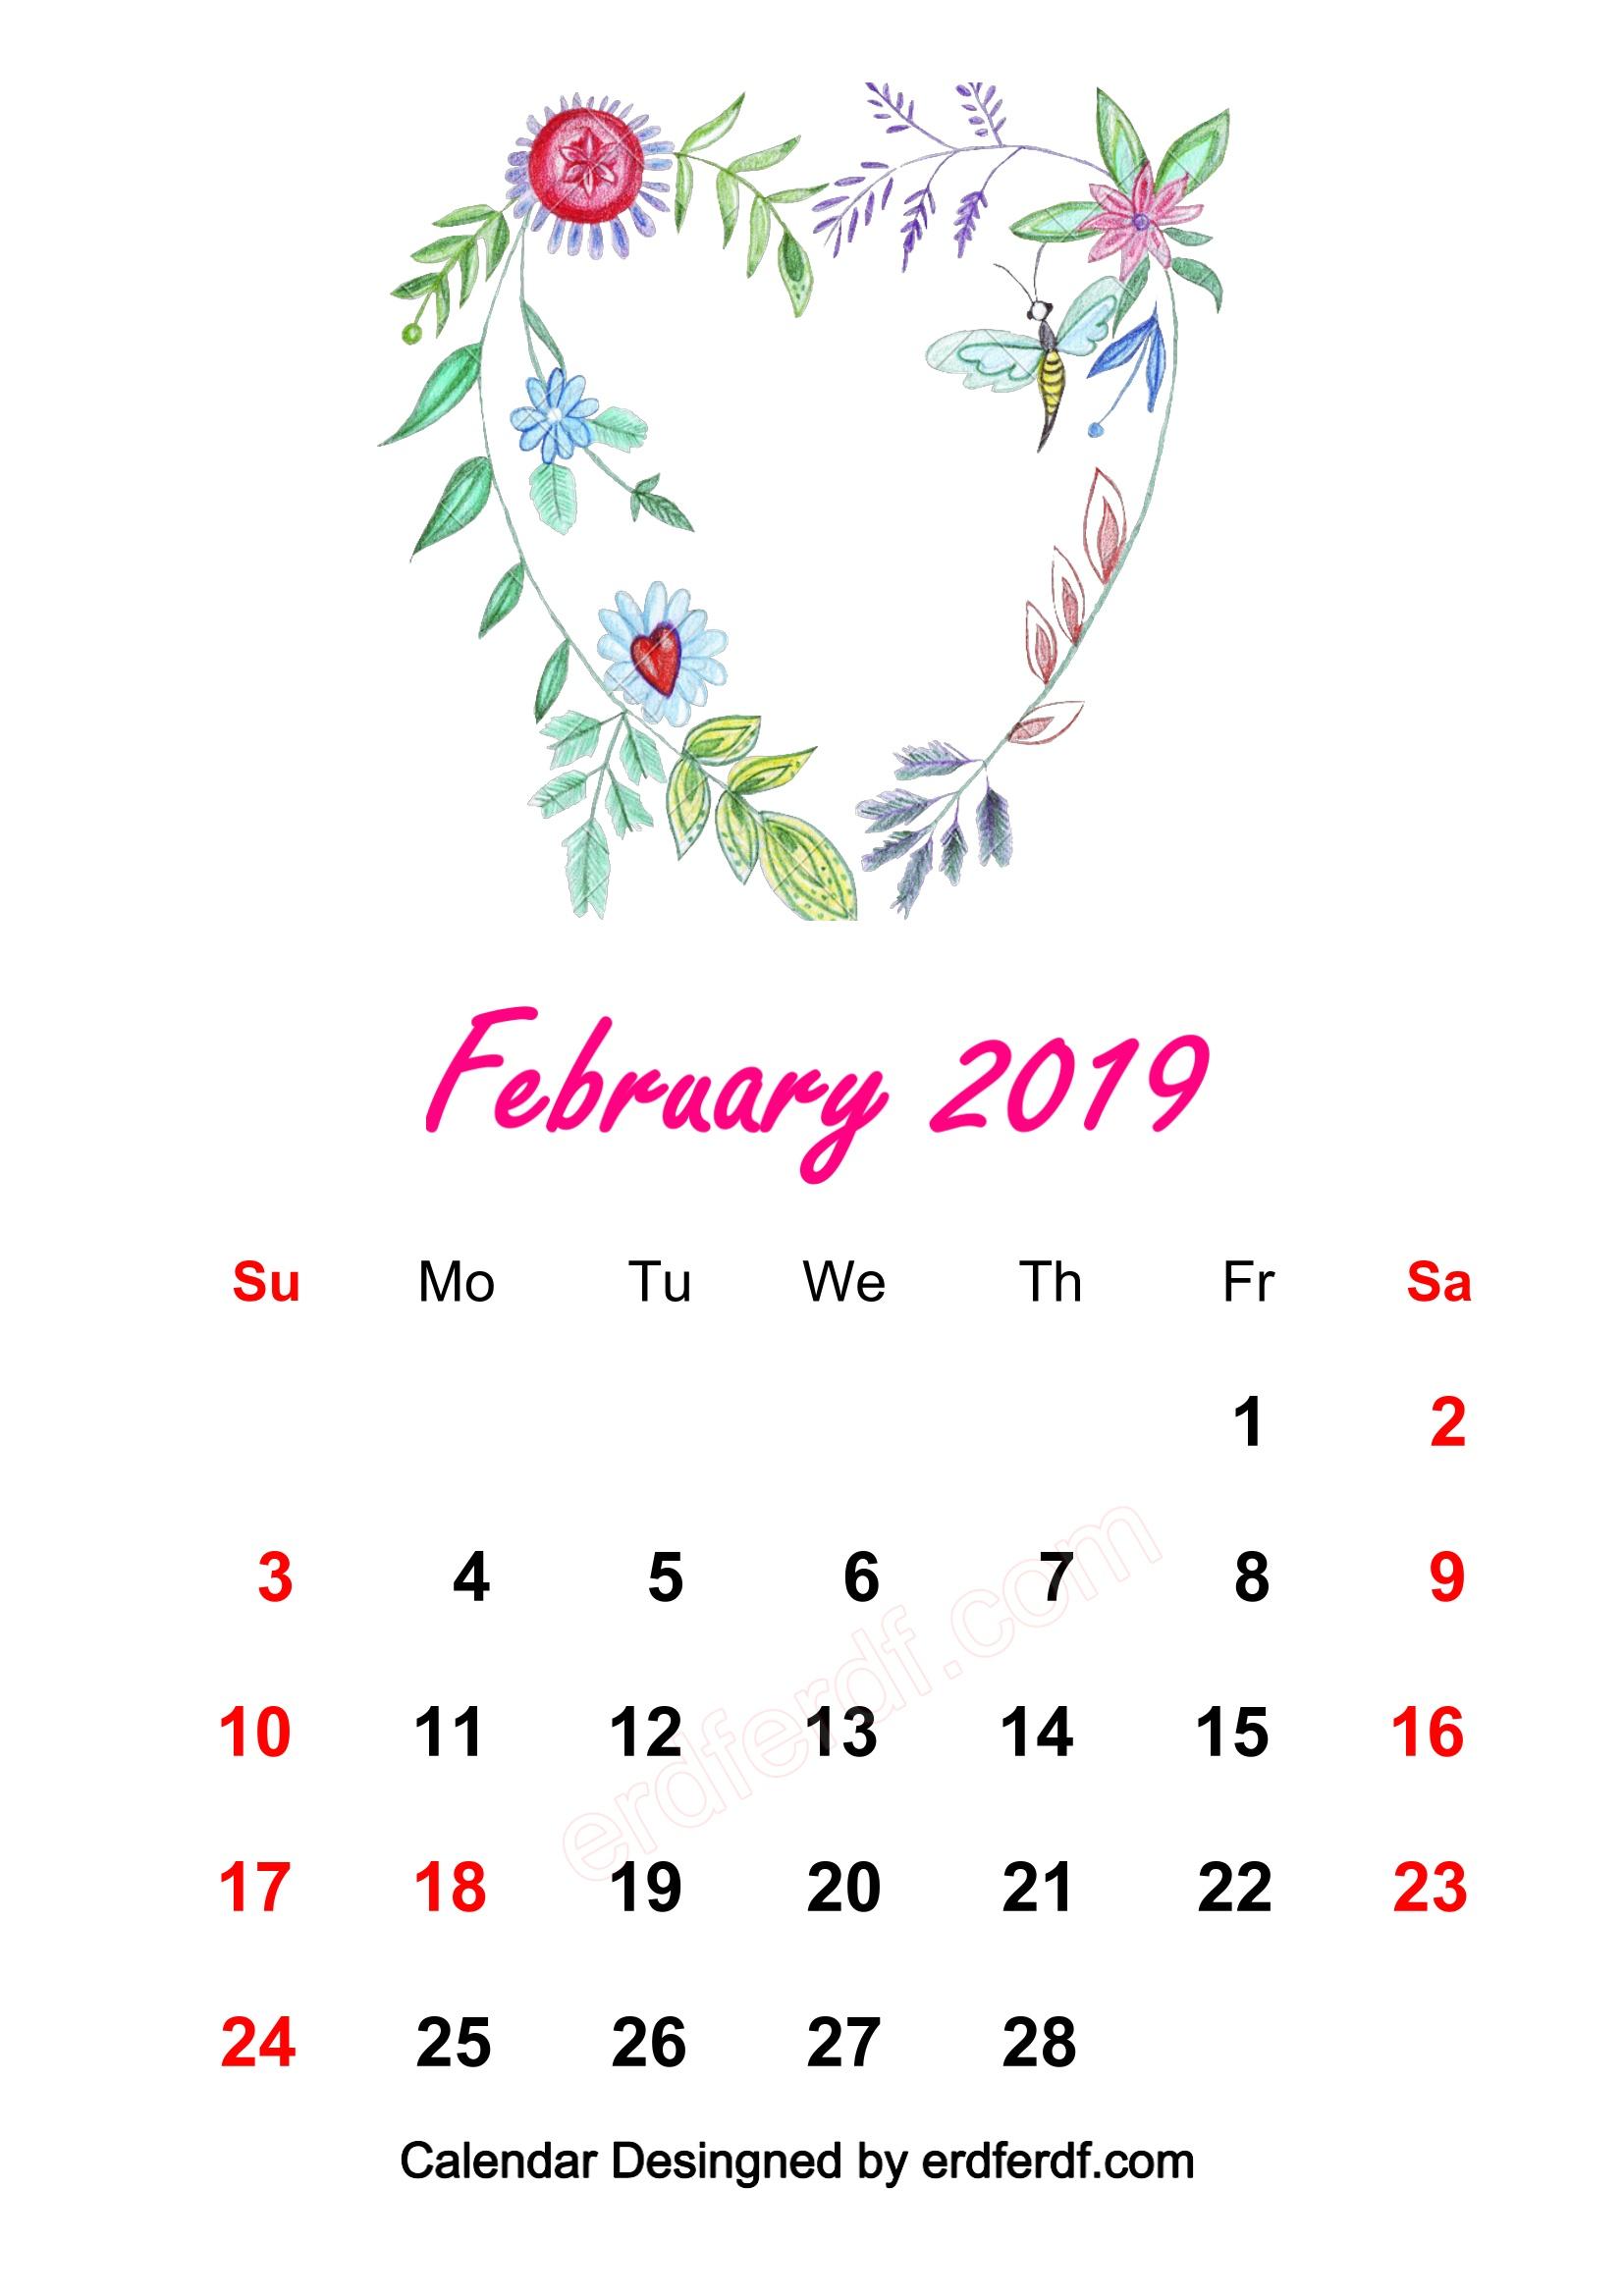 8 Love February 2019 HD Calendar Wallpapers